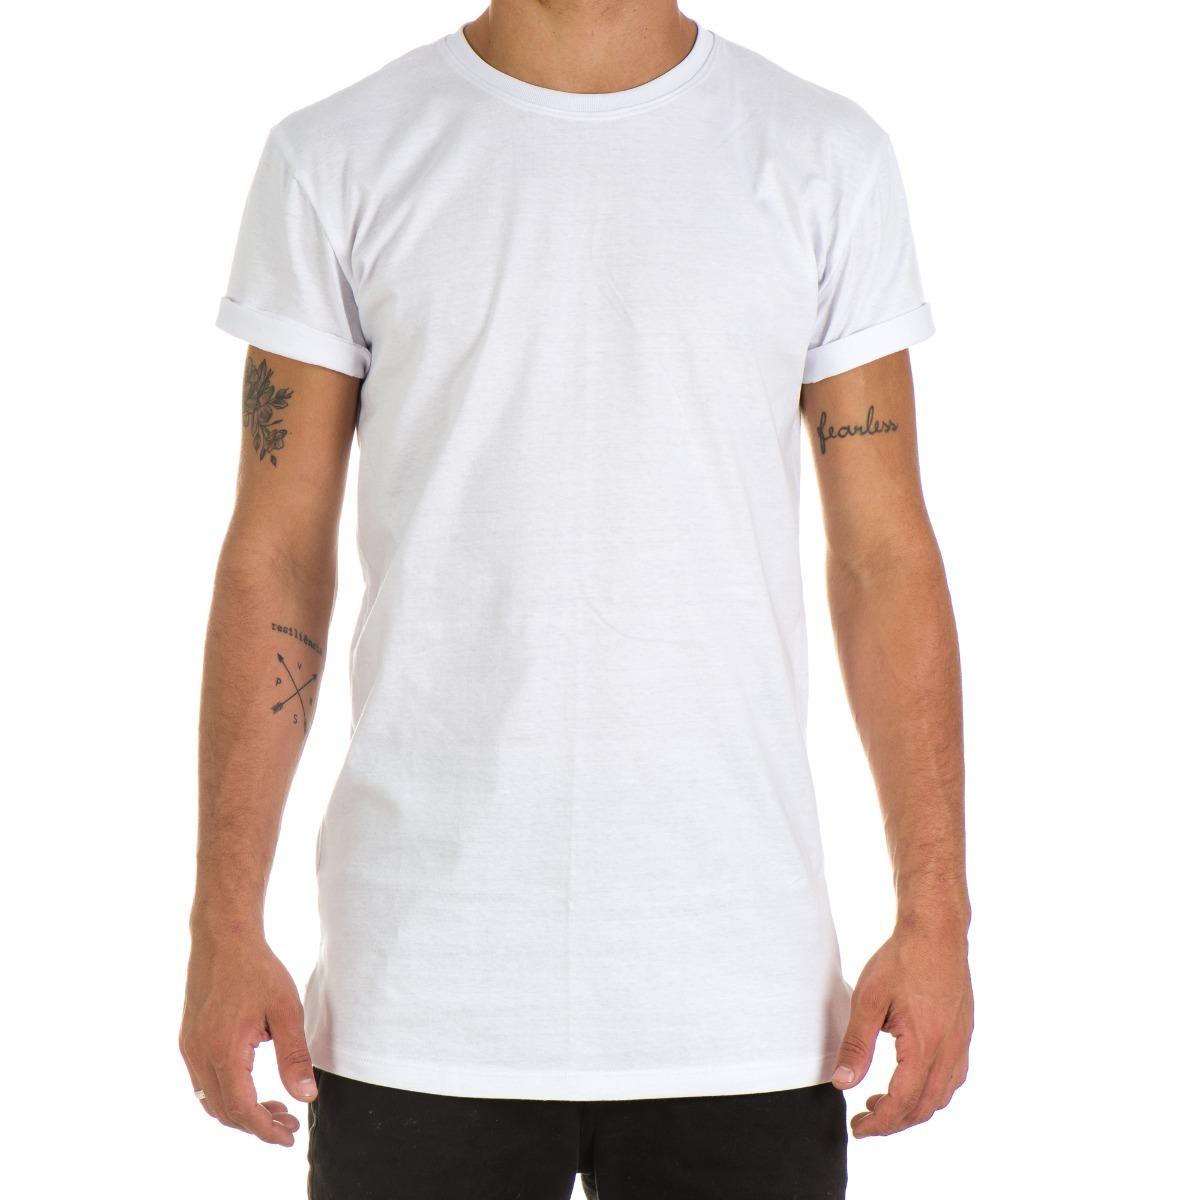 5641110a5 camiseta longline lisa unissex oversized swag maior costas. Carregando zoom.